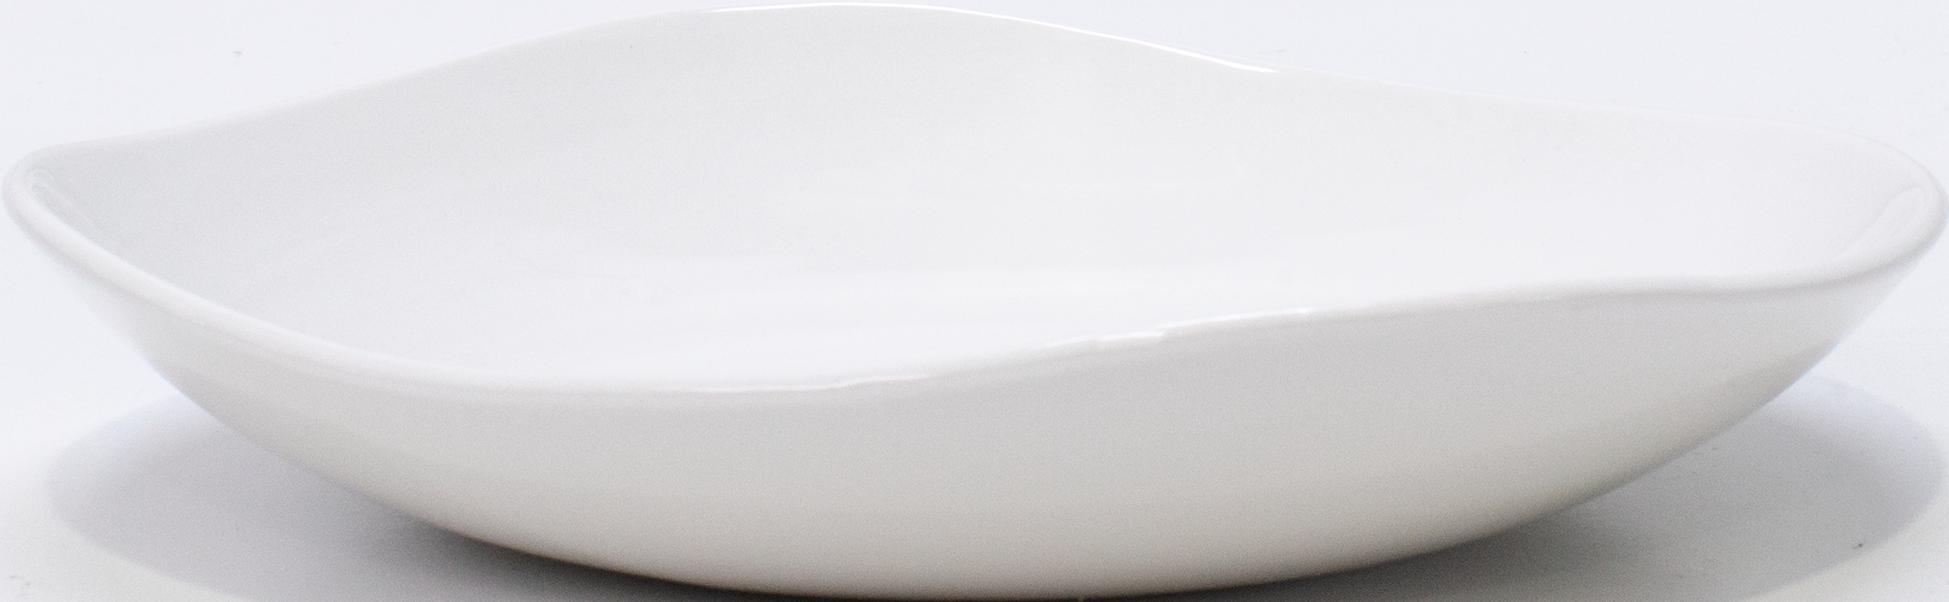 Estelle share bowl (large)